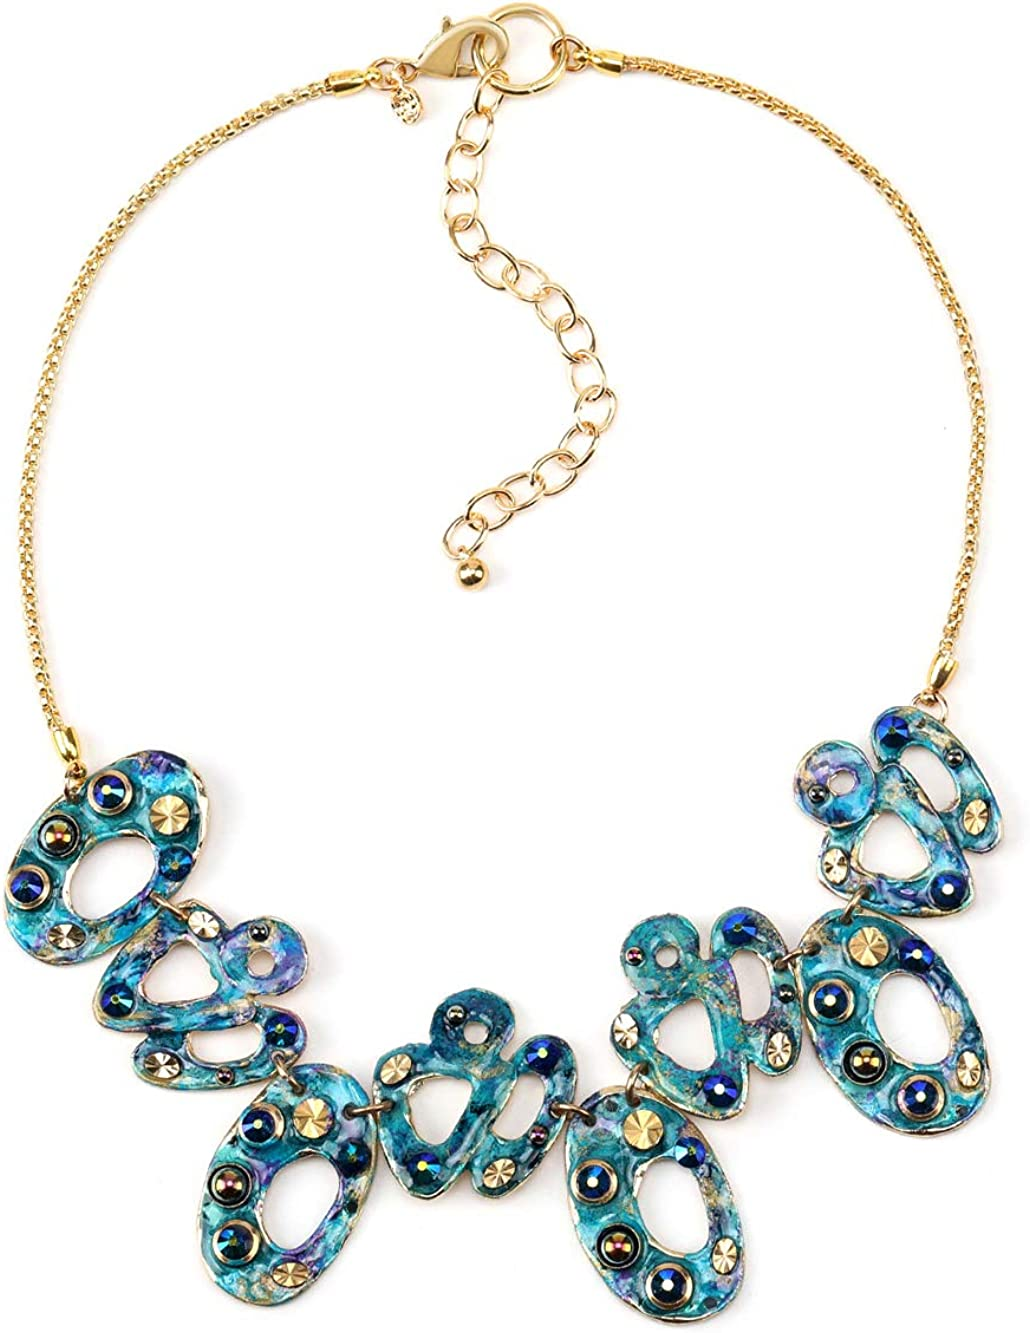 Treska Brand Linked Pieces Collar Necklace